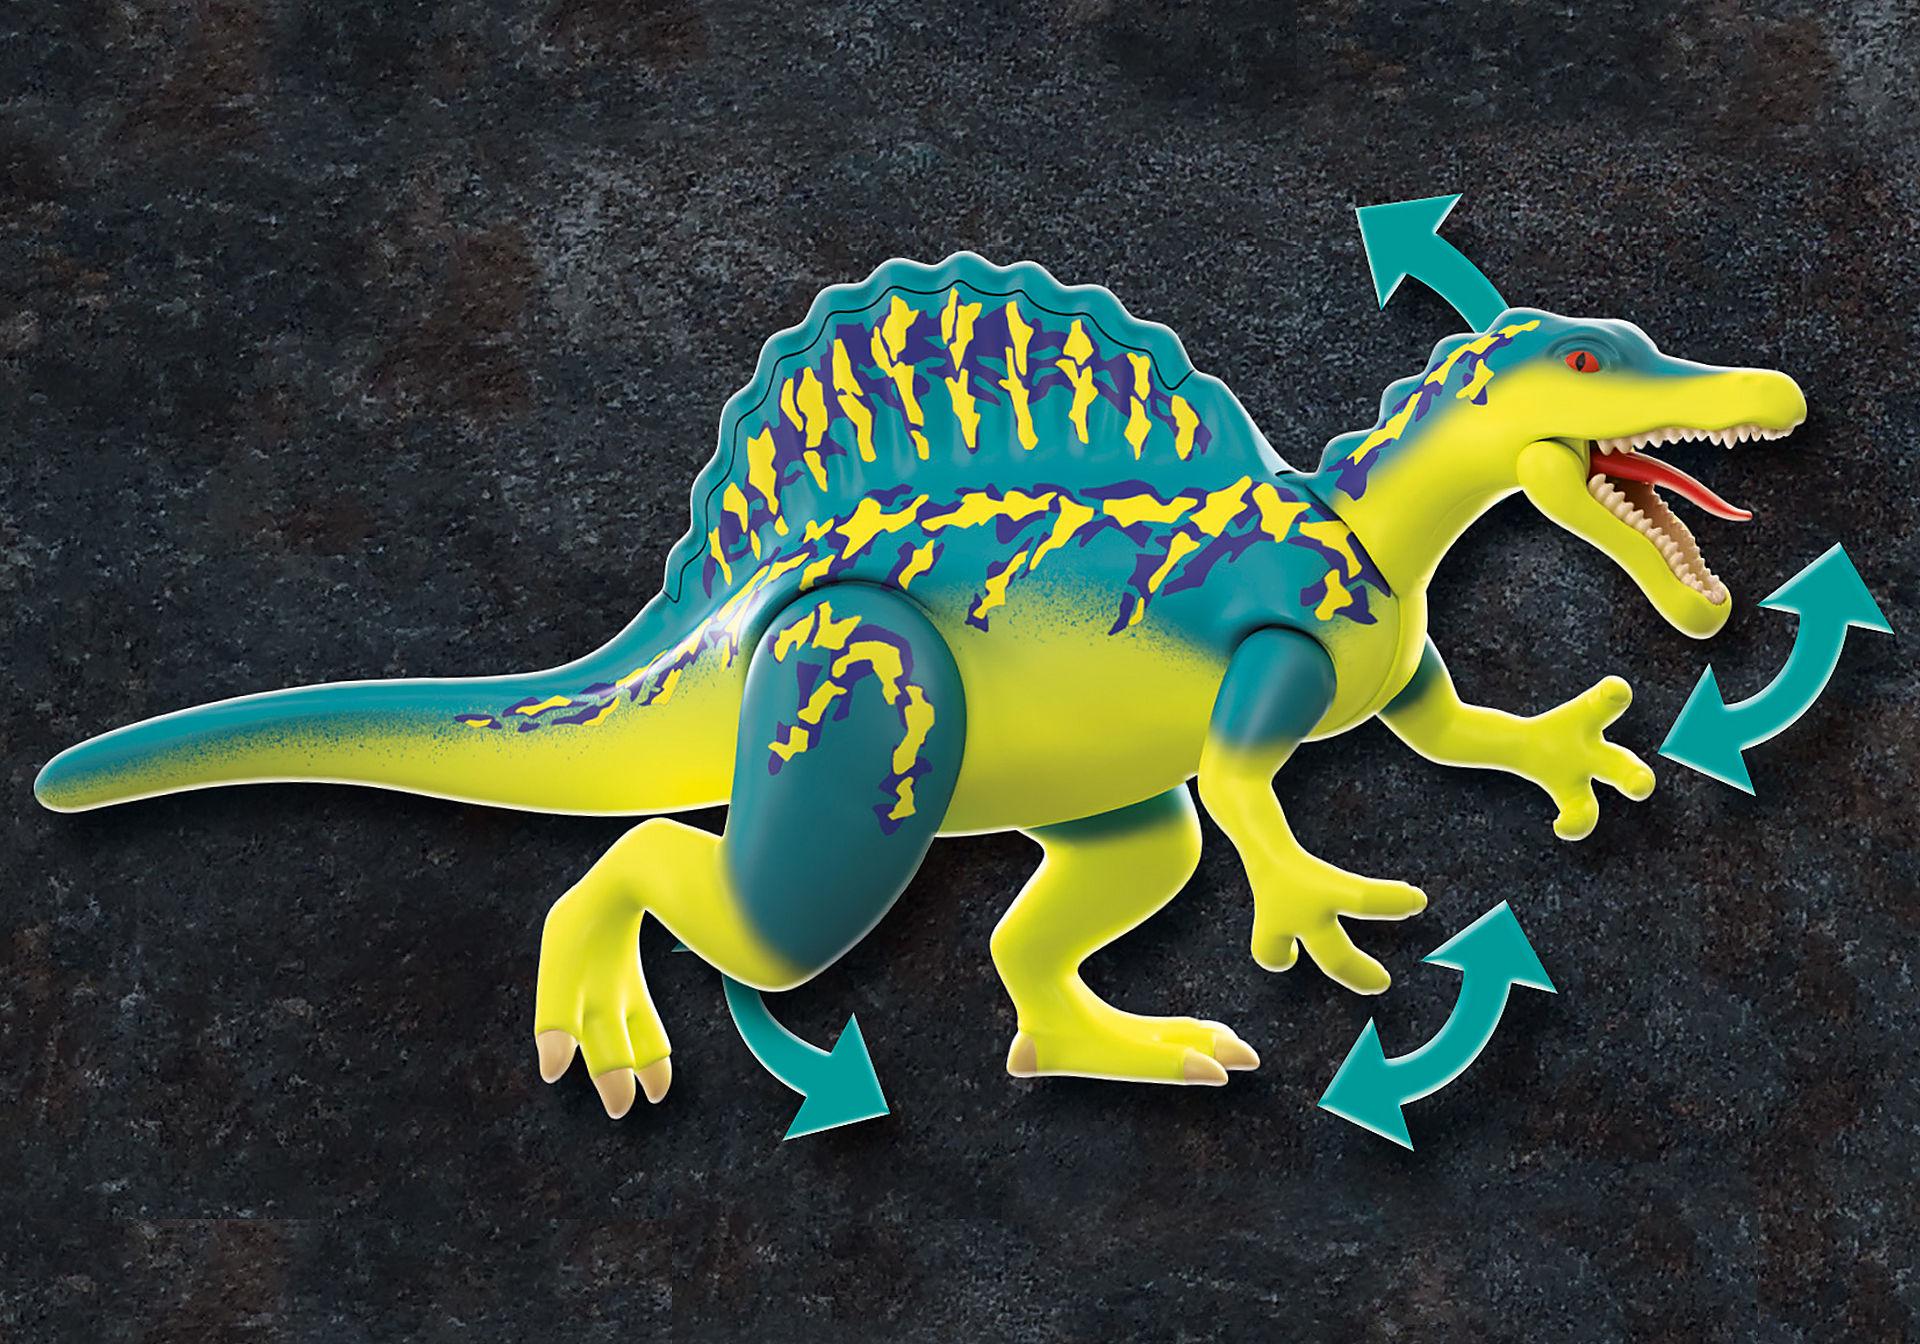 70625 Spinosaurus: Dobbelt forsvarsstyrke zoom image4